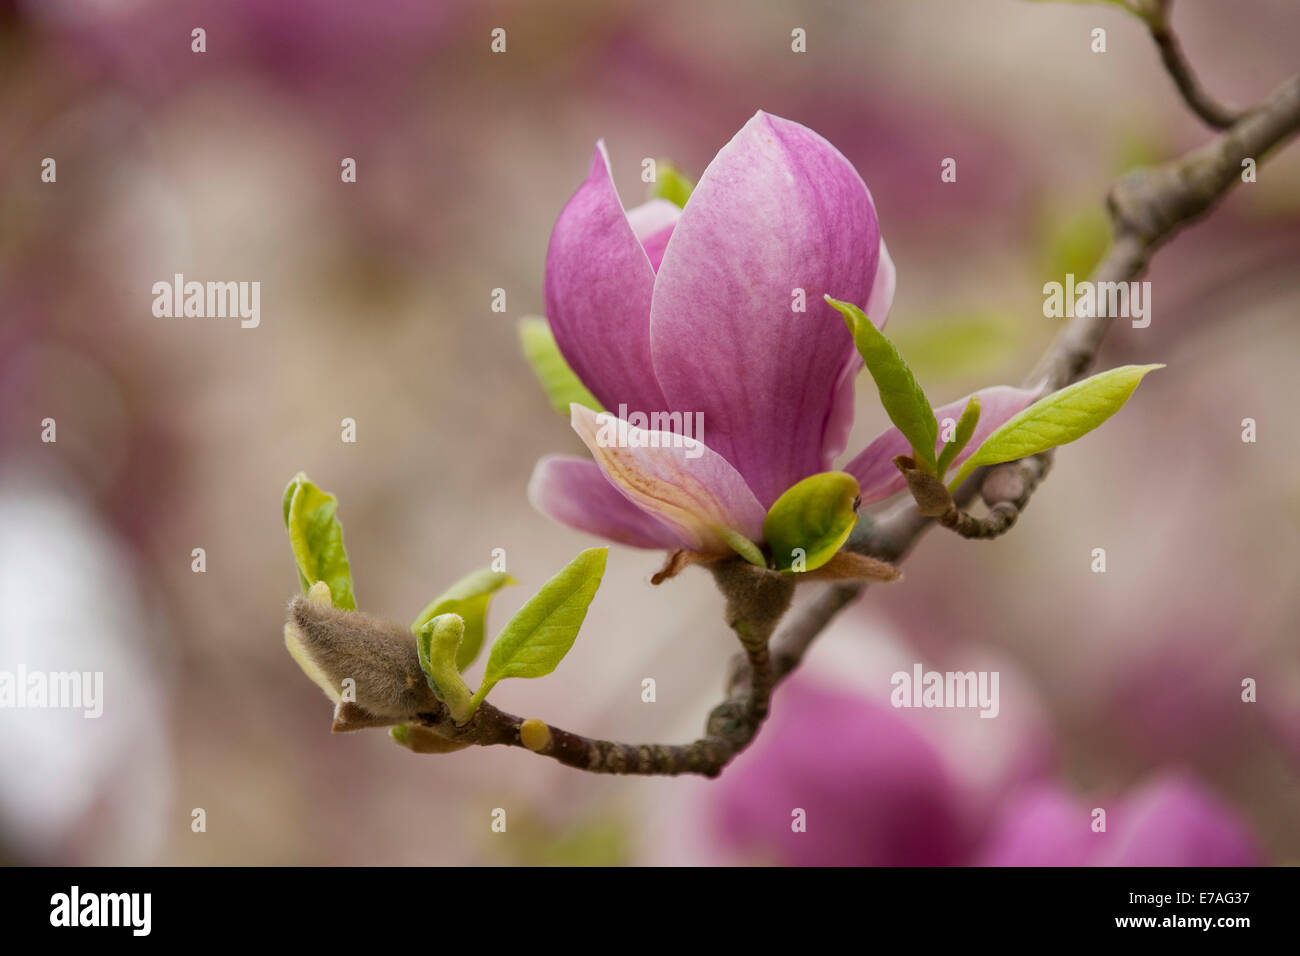 Saucer Magnolia (Magnolia x soulangeana), flowering, Thuringia, Germany - Stock Image